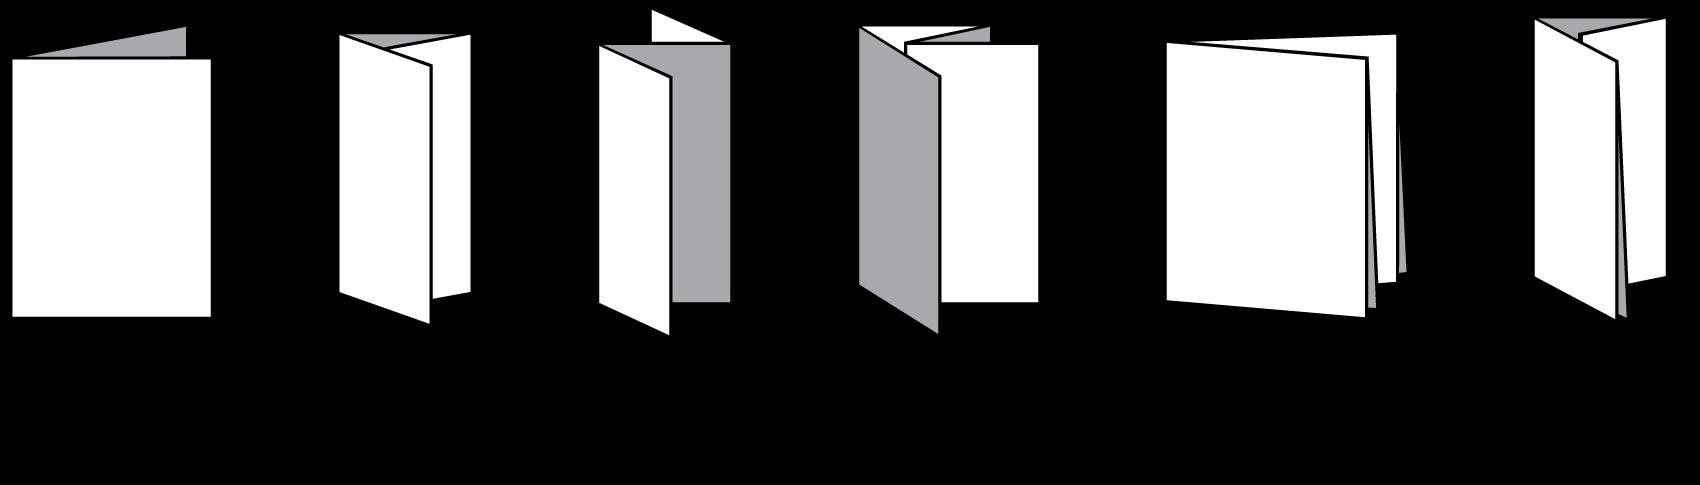 Folding_Examples_6-types_1-row